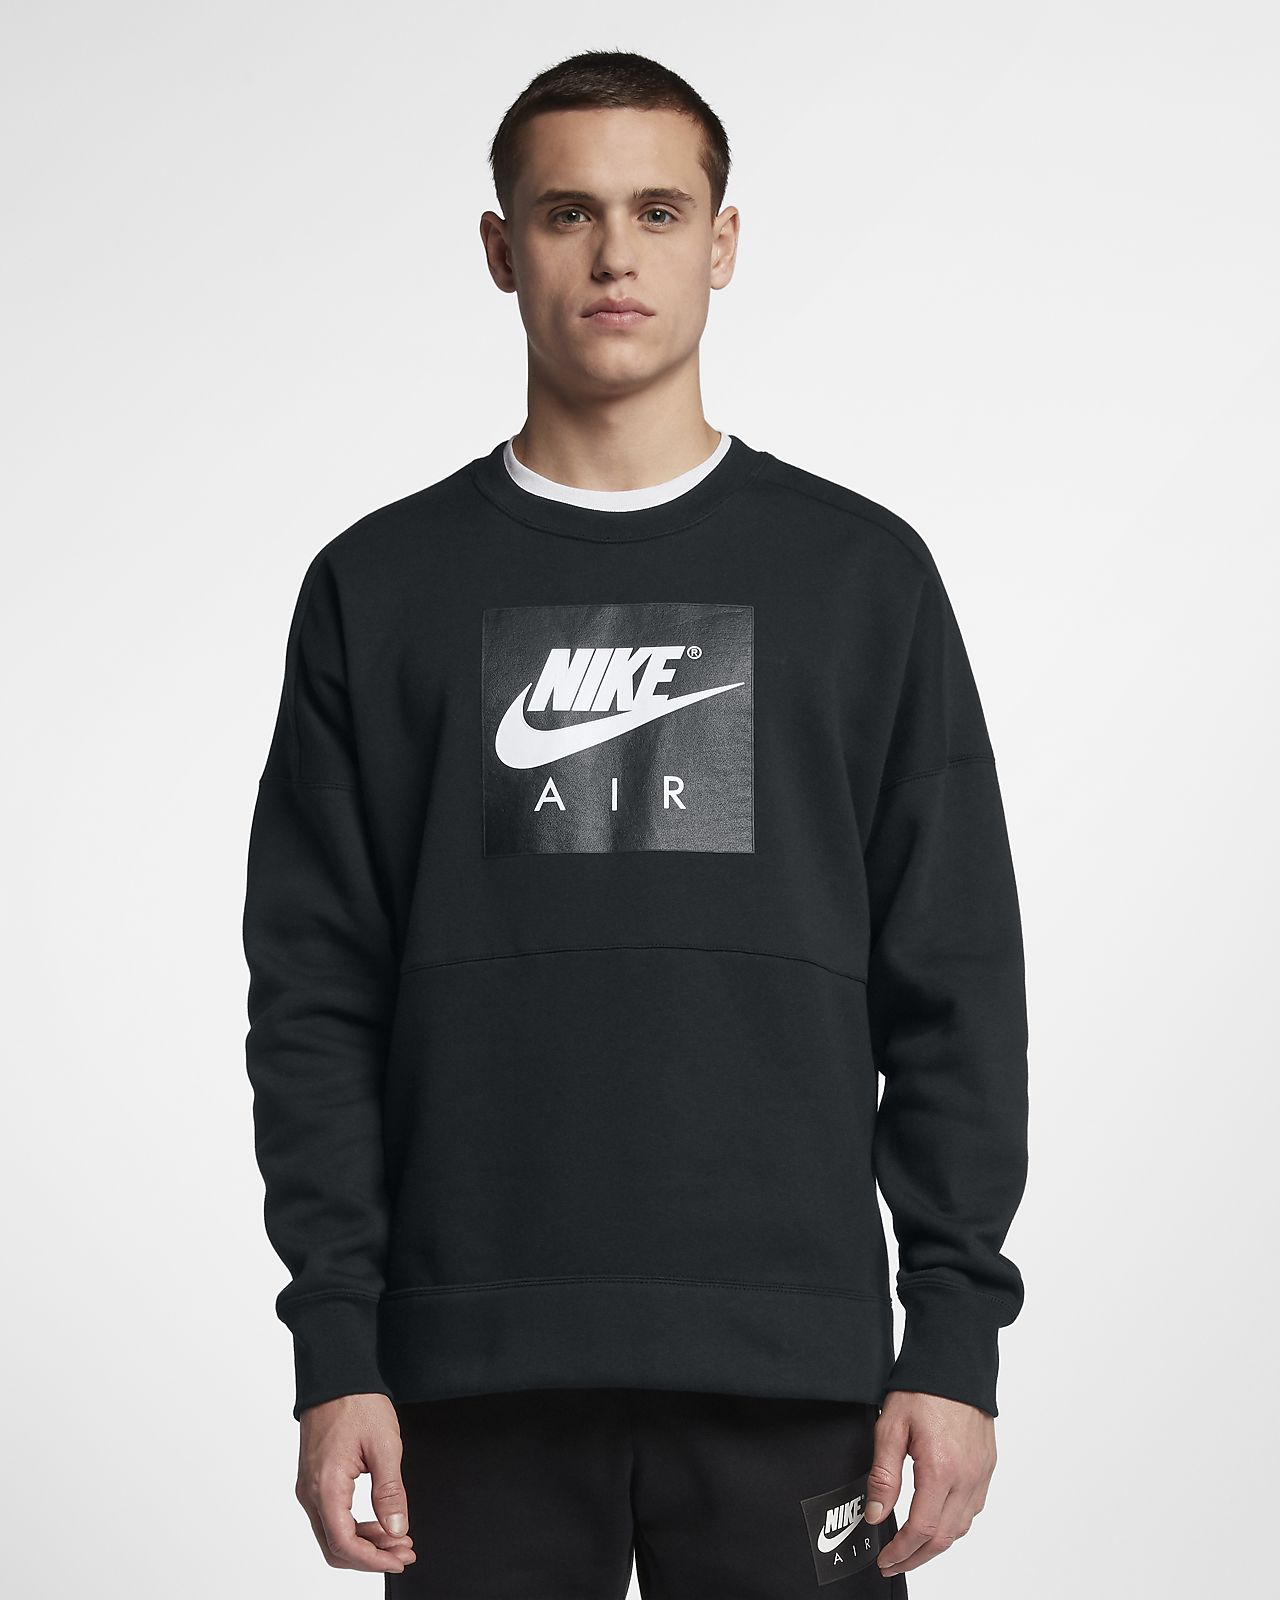 Fleece Homme Tissu Air Nike En Haut Ch Pour fwFx6R6q8